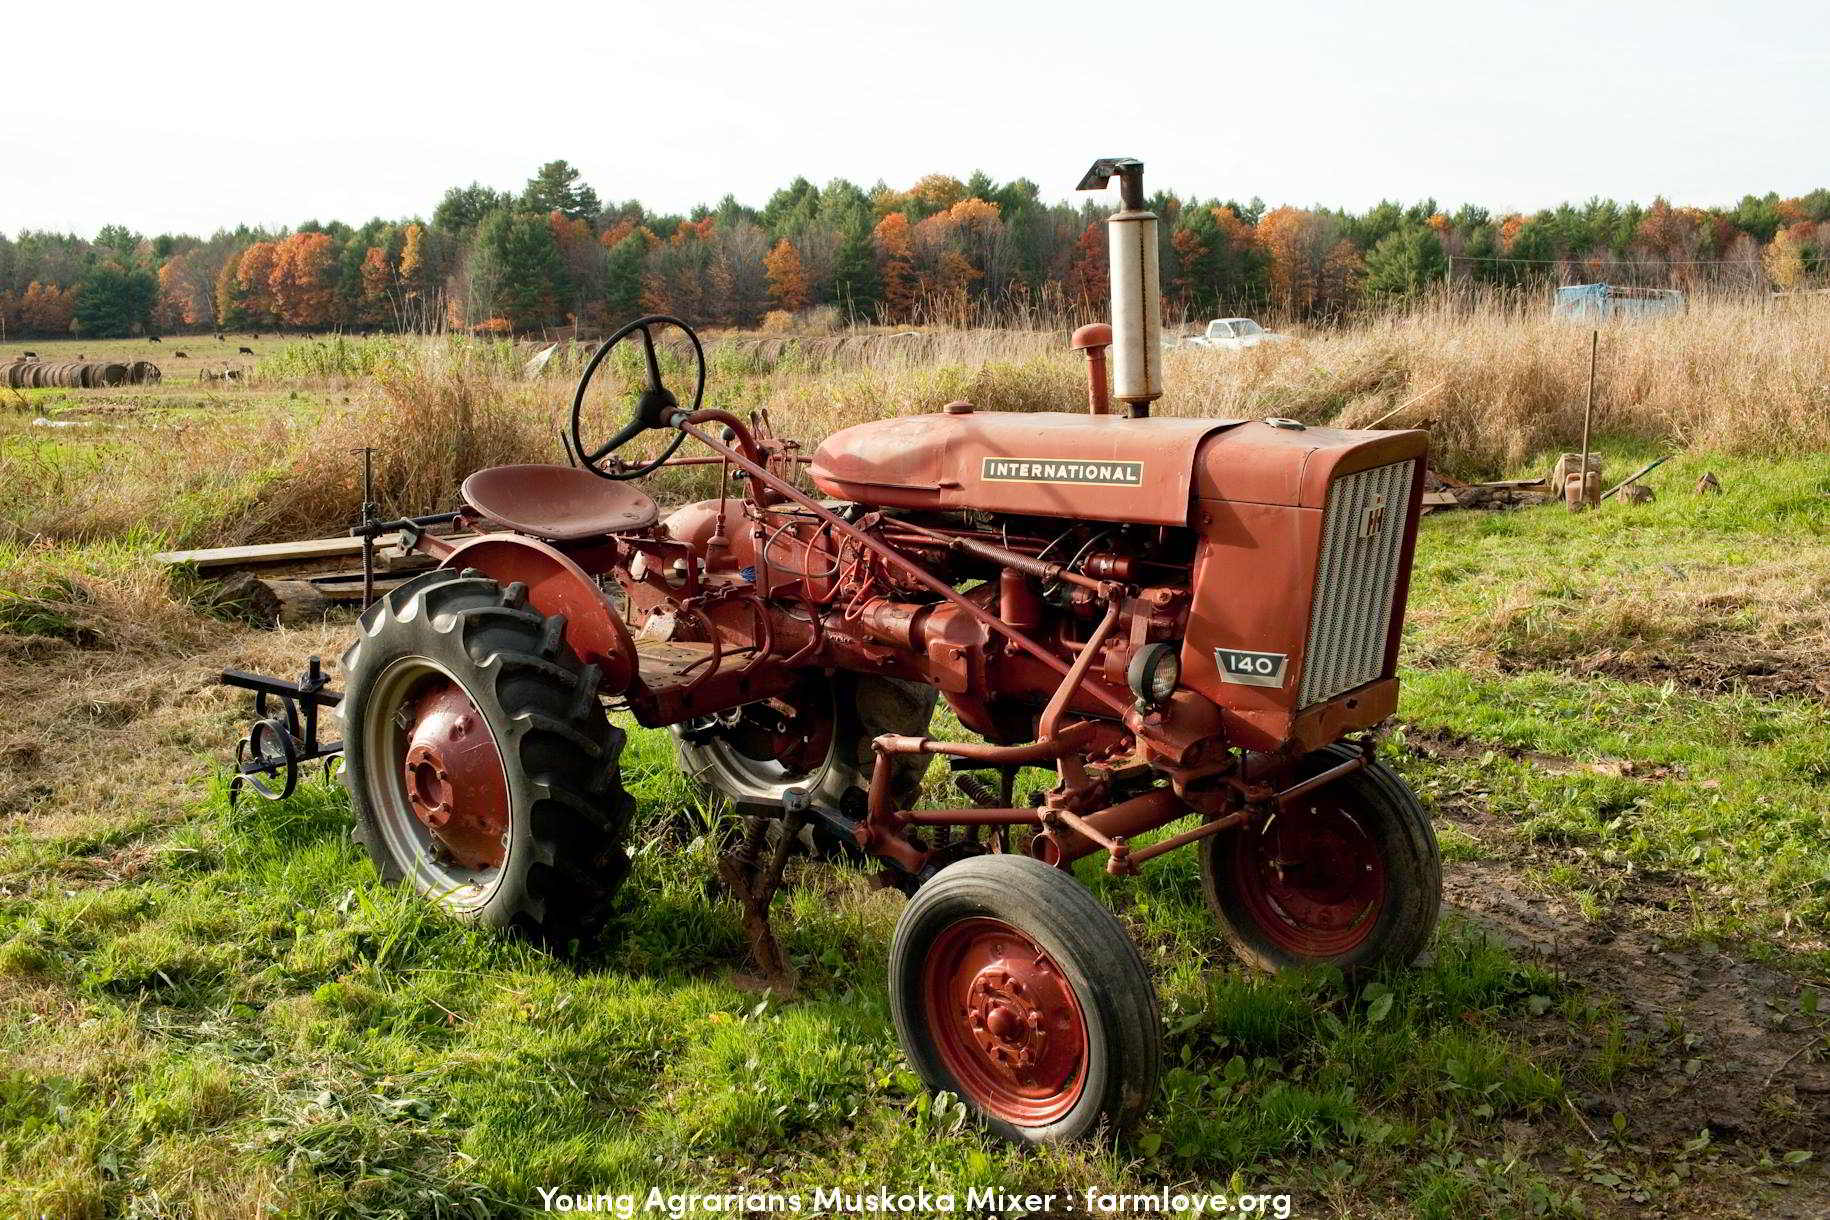 Job Young Agrarians Land Match